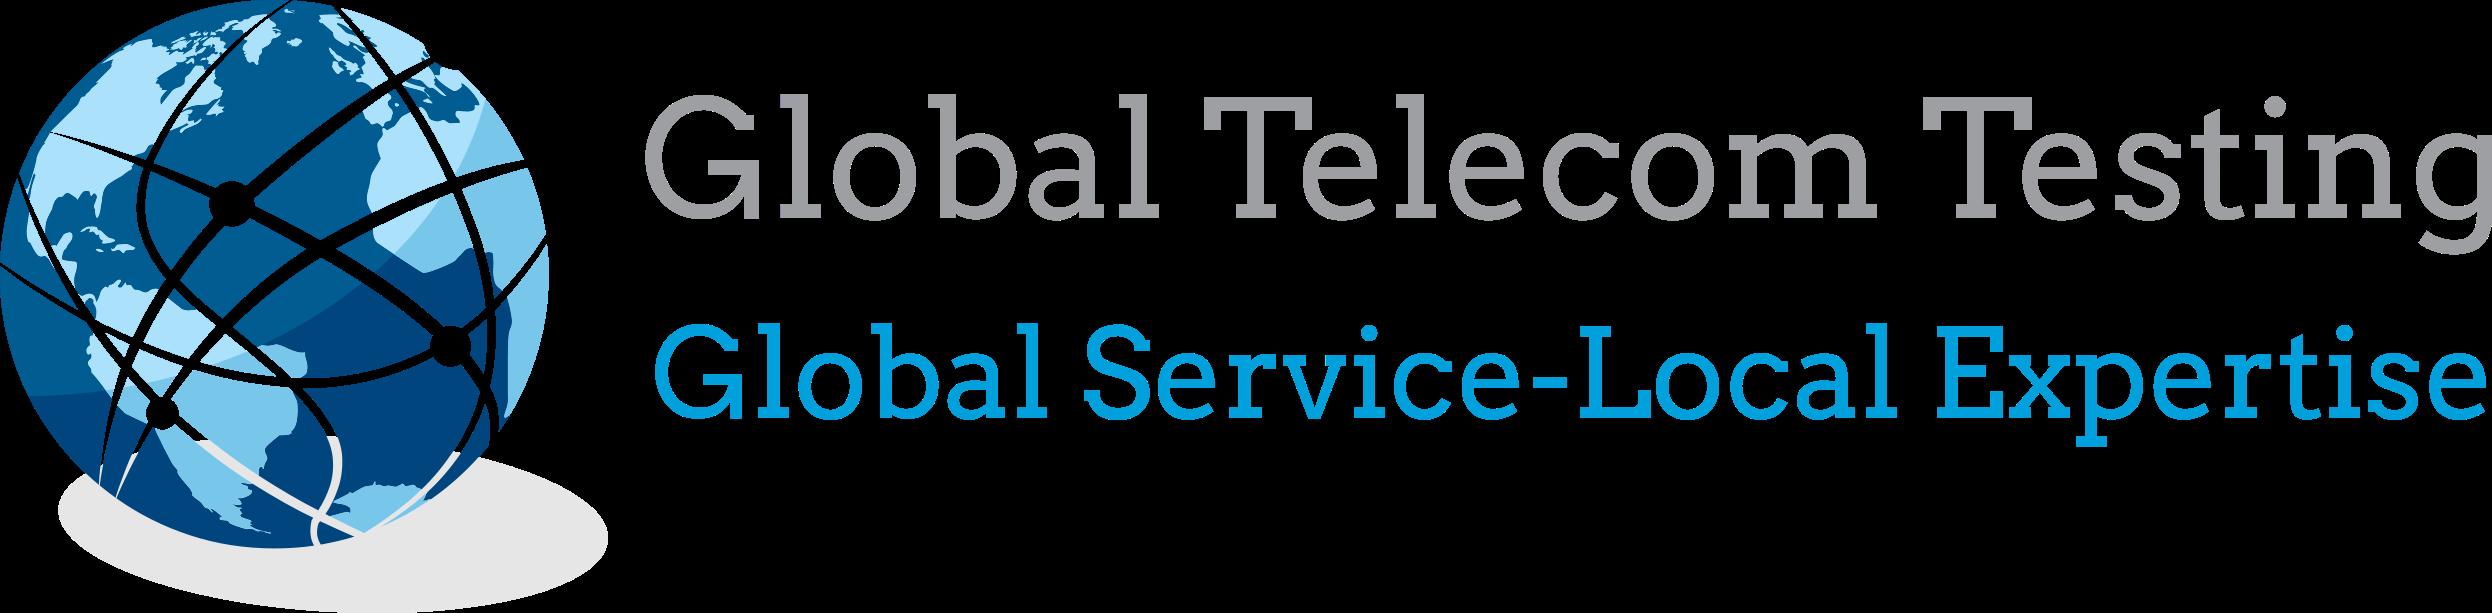 Global Telecom Testing